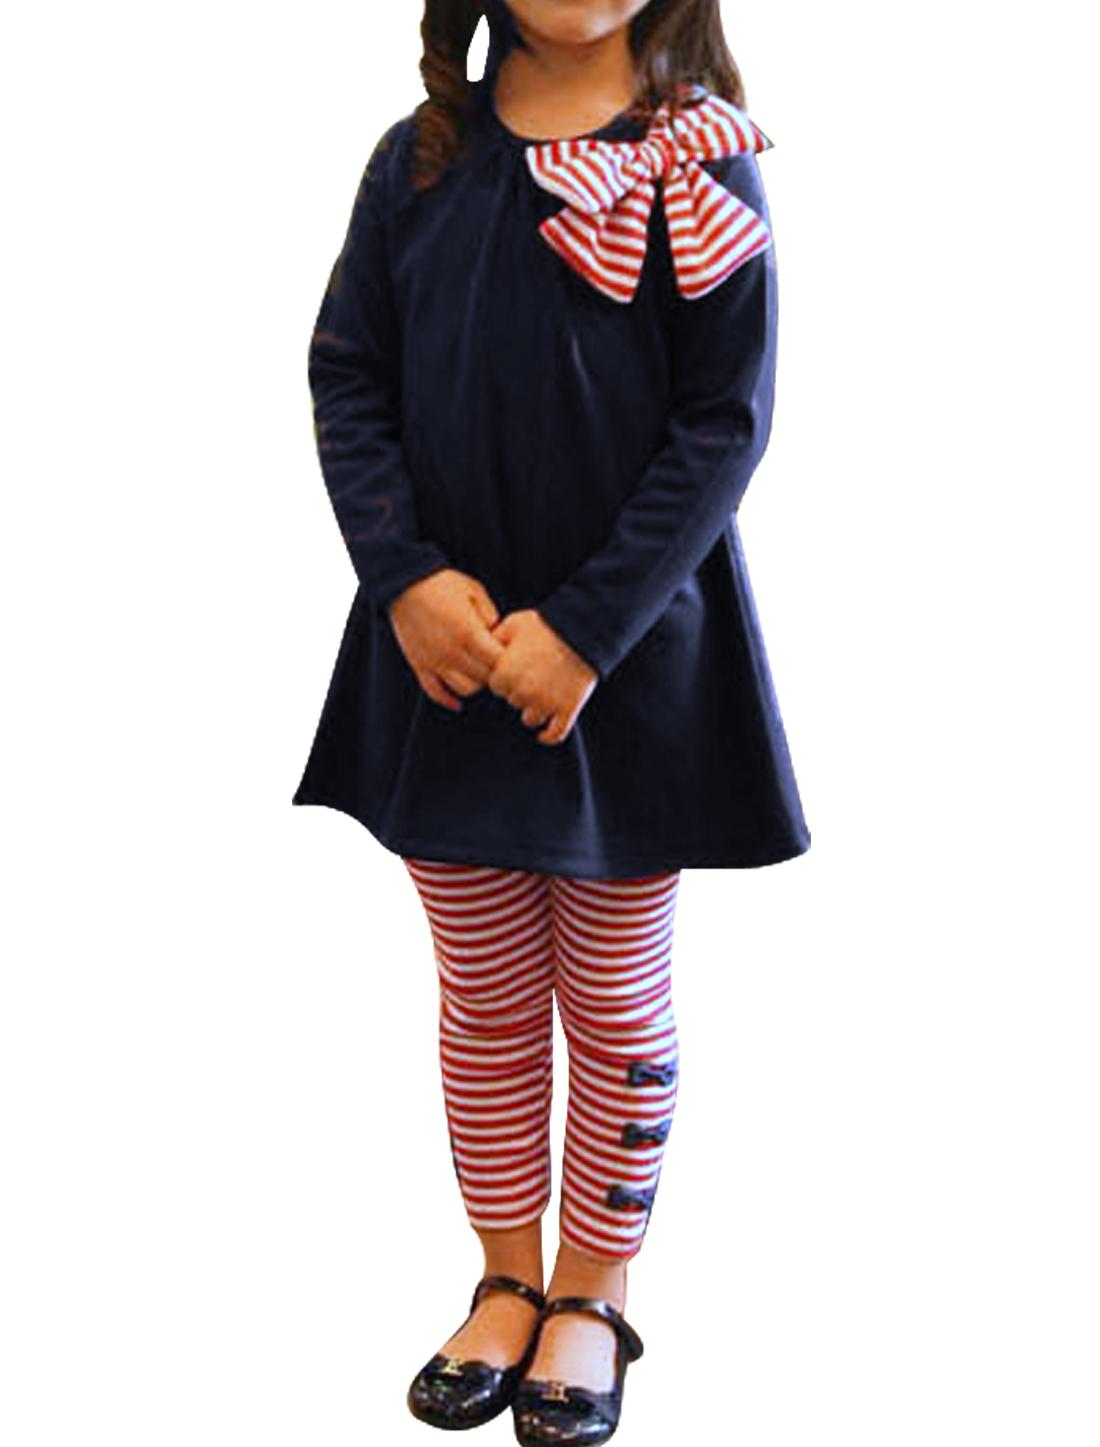 Girls Autumn Pullover Shirt & Stretchy Waist Pants Navy Blue Red 5